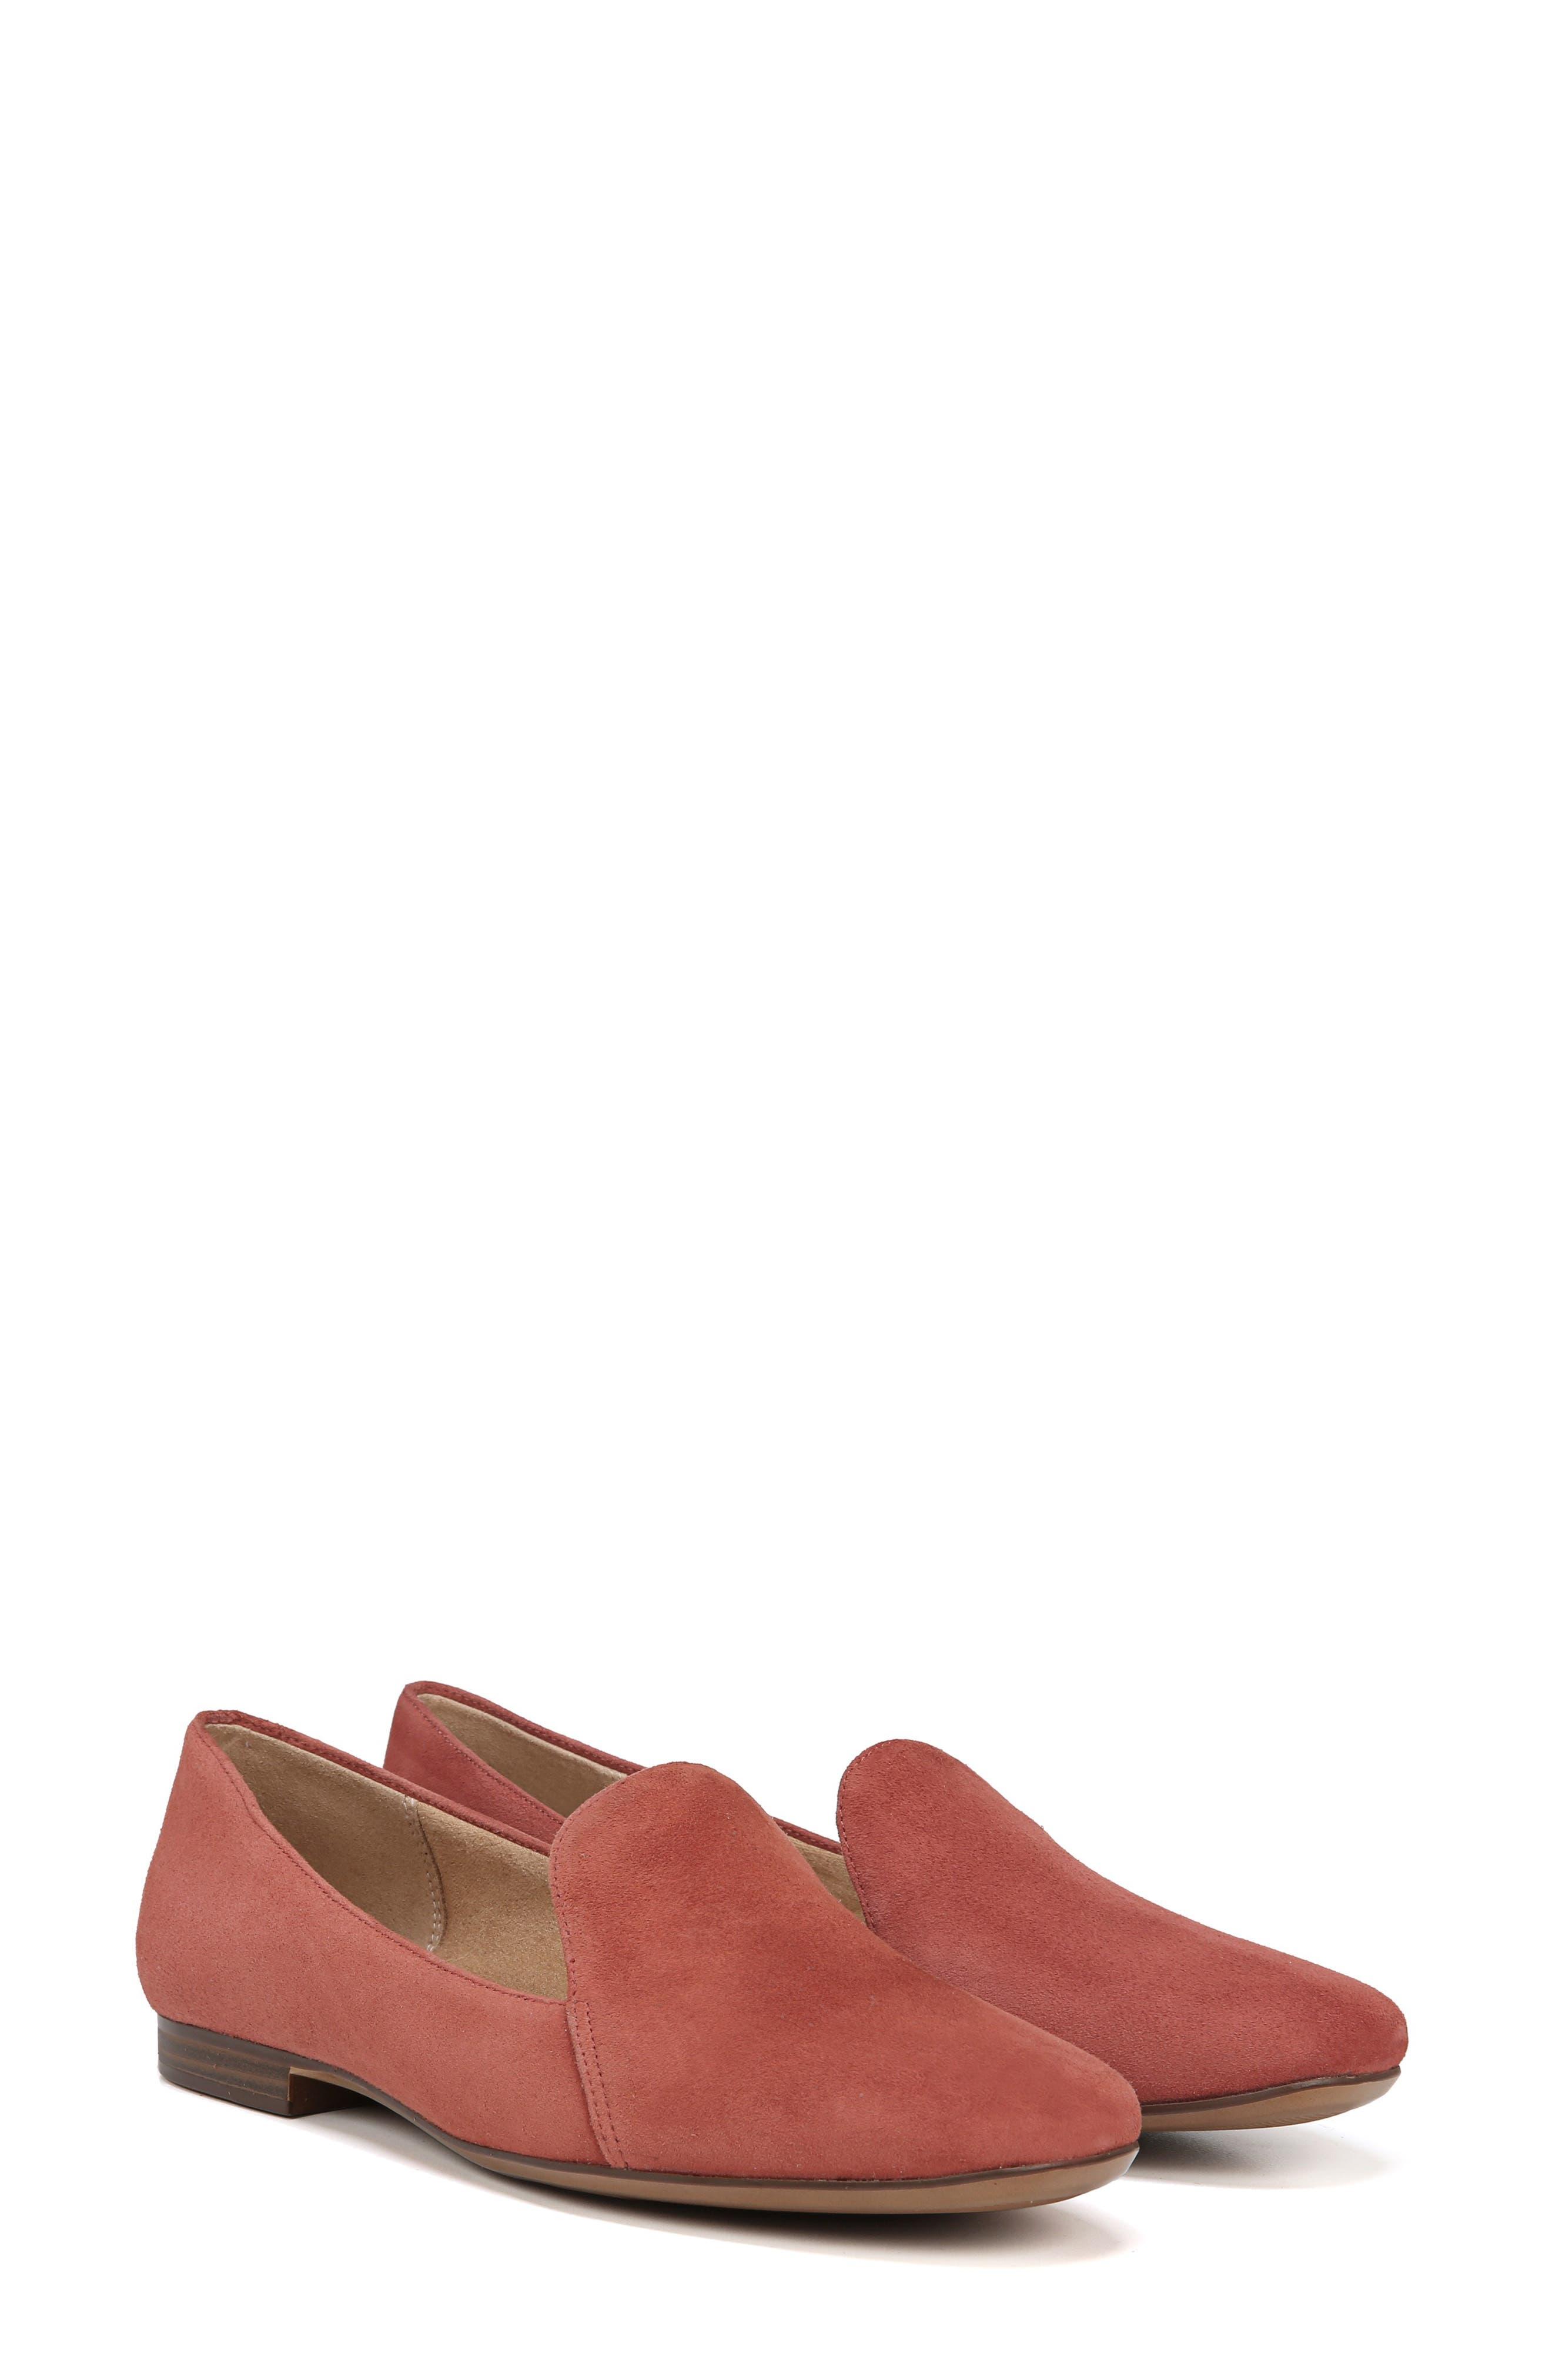 Emiline Flat Loafer,                             Alternate thumbnail 8, color,                             DESERT CLAY SUEDE